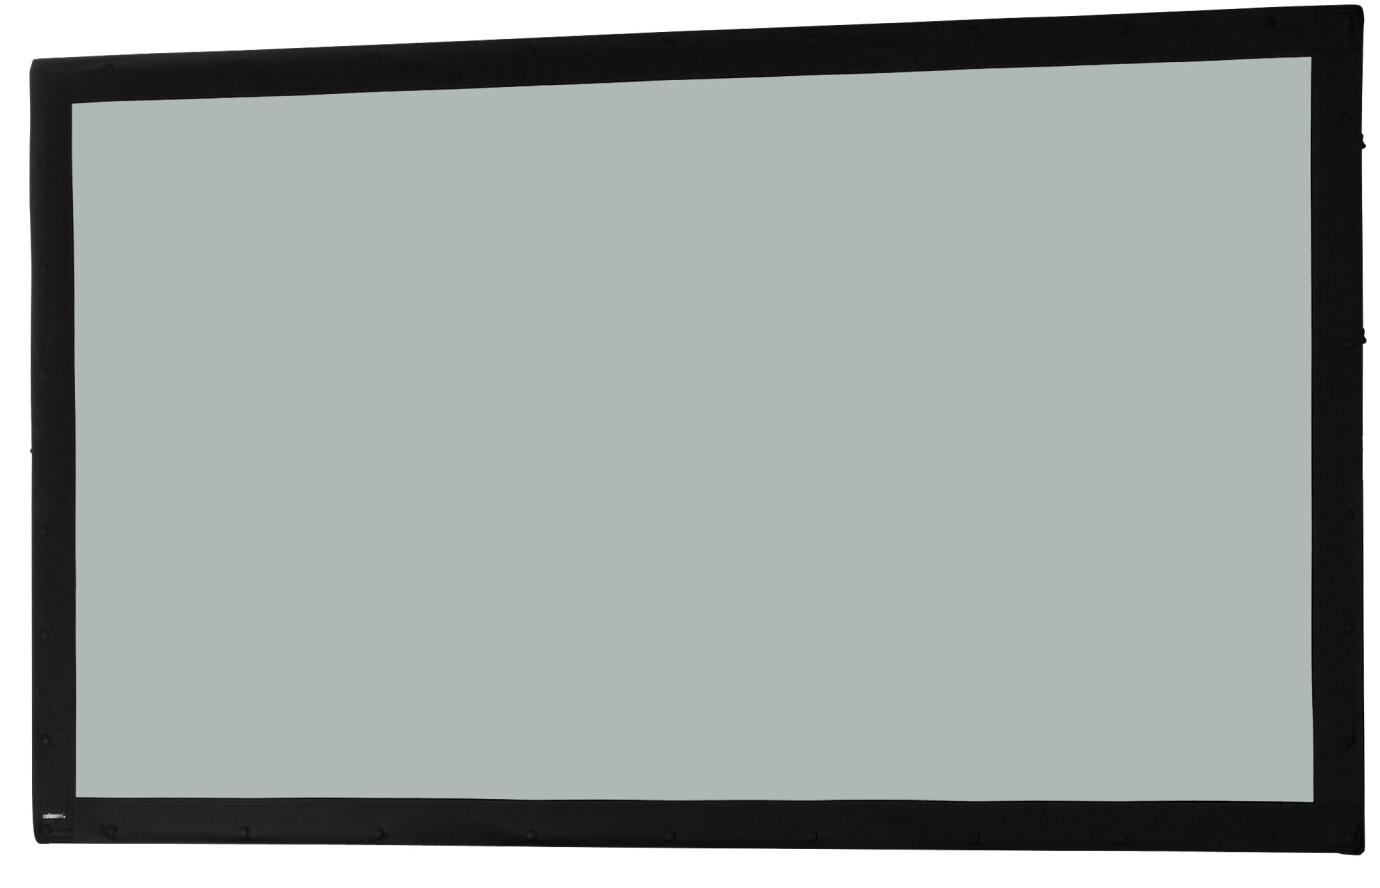 celexon Tuch für Faltrahmen Mobil Expert - 406 x 228 cm Rückprojektion